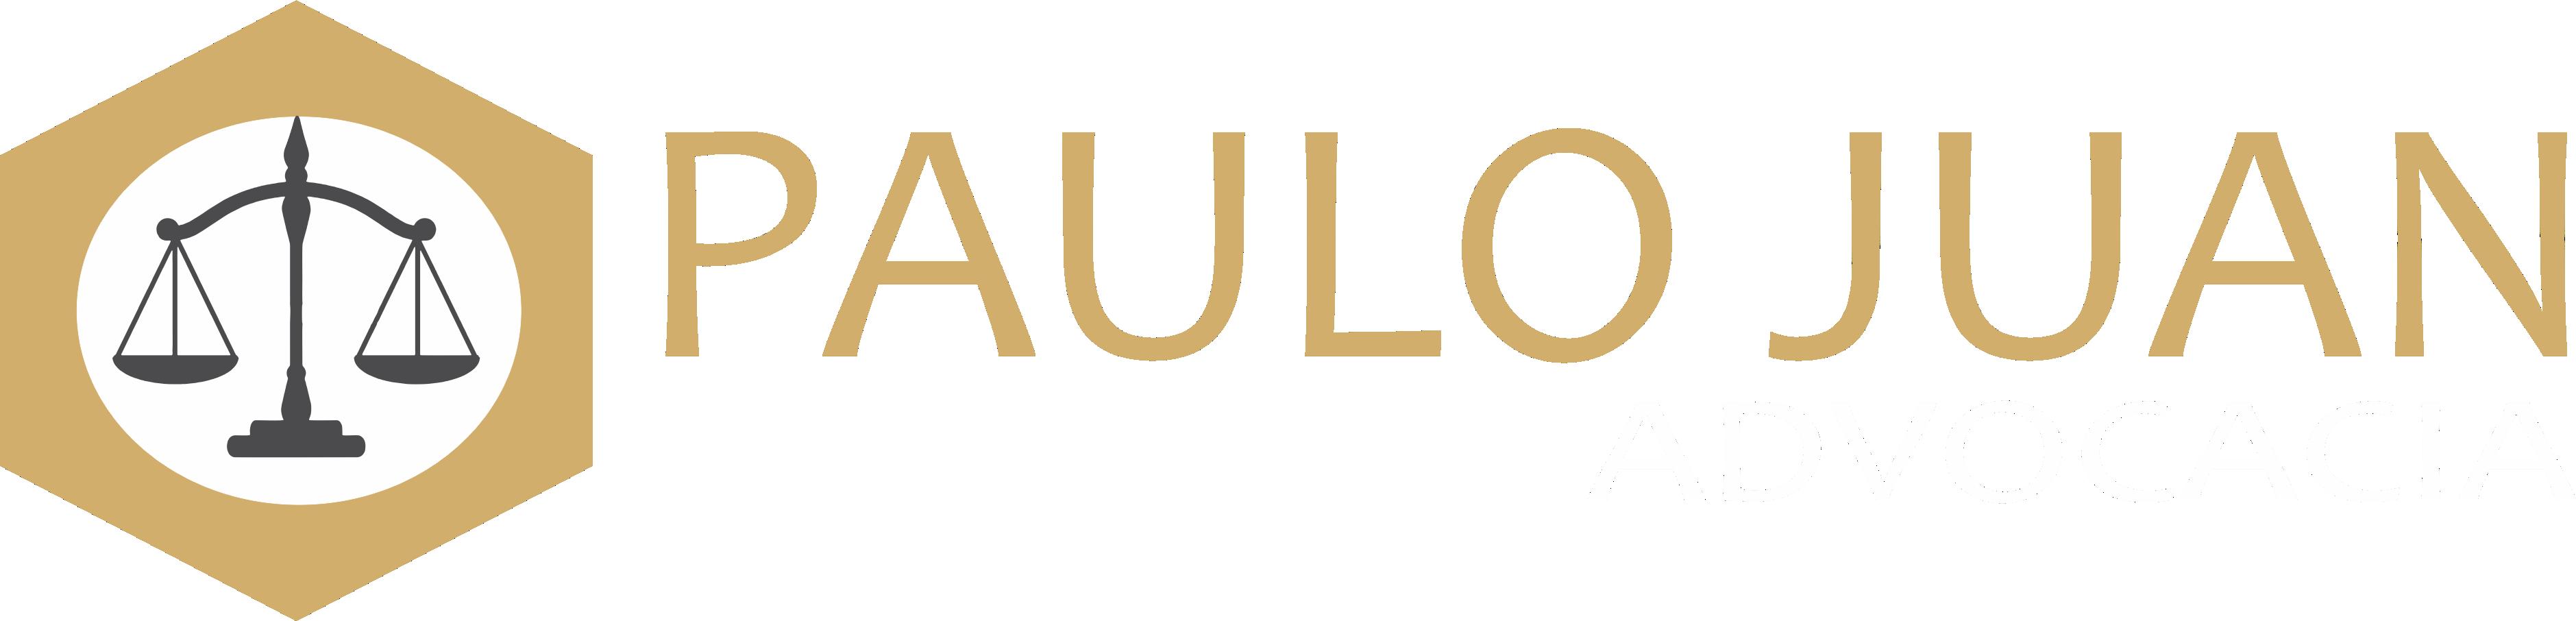 Paulo Juan Advocacia